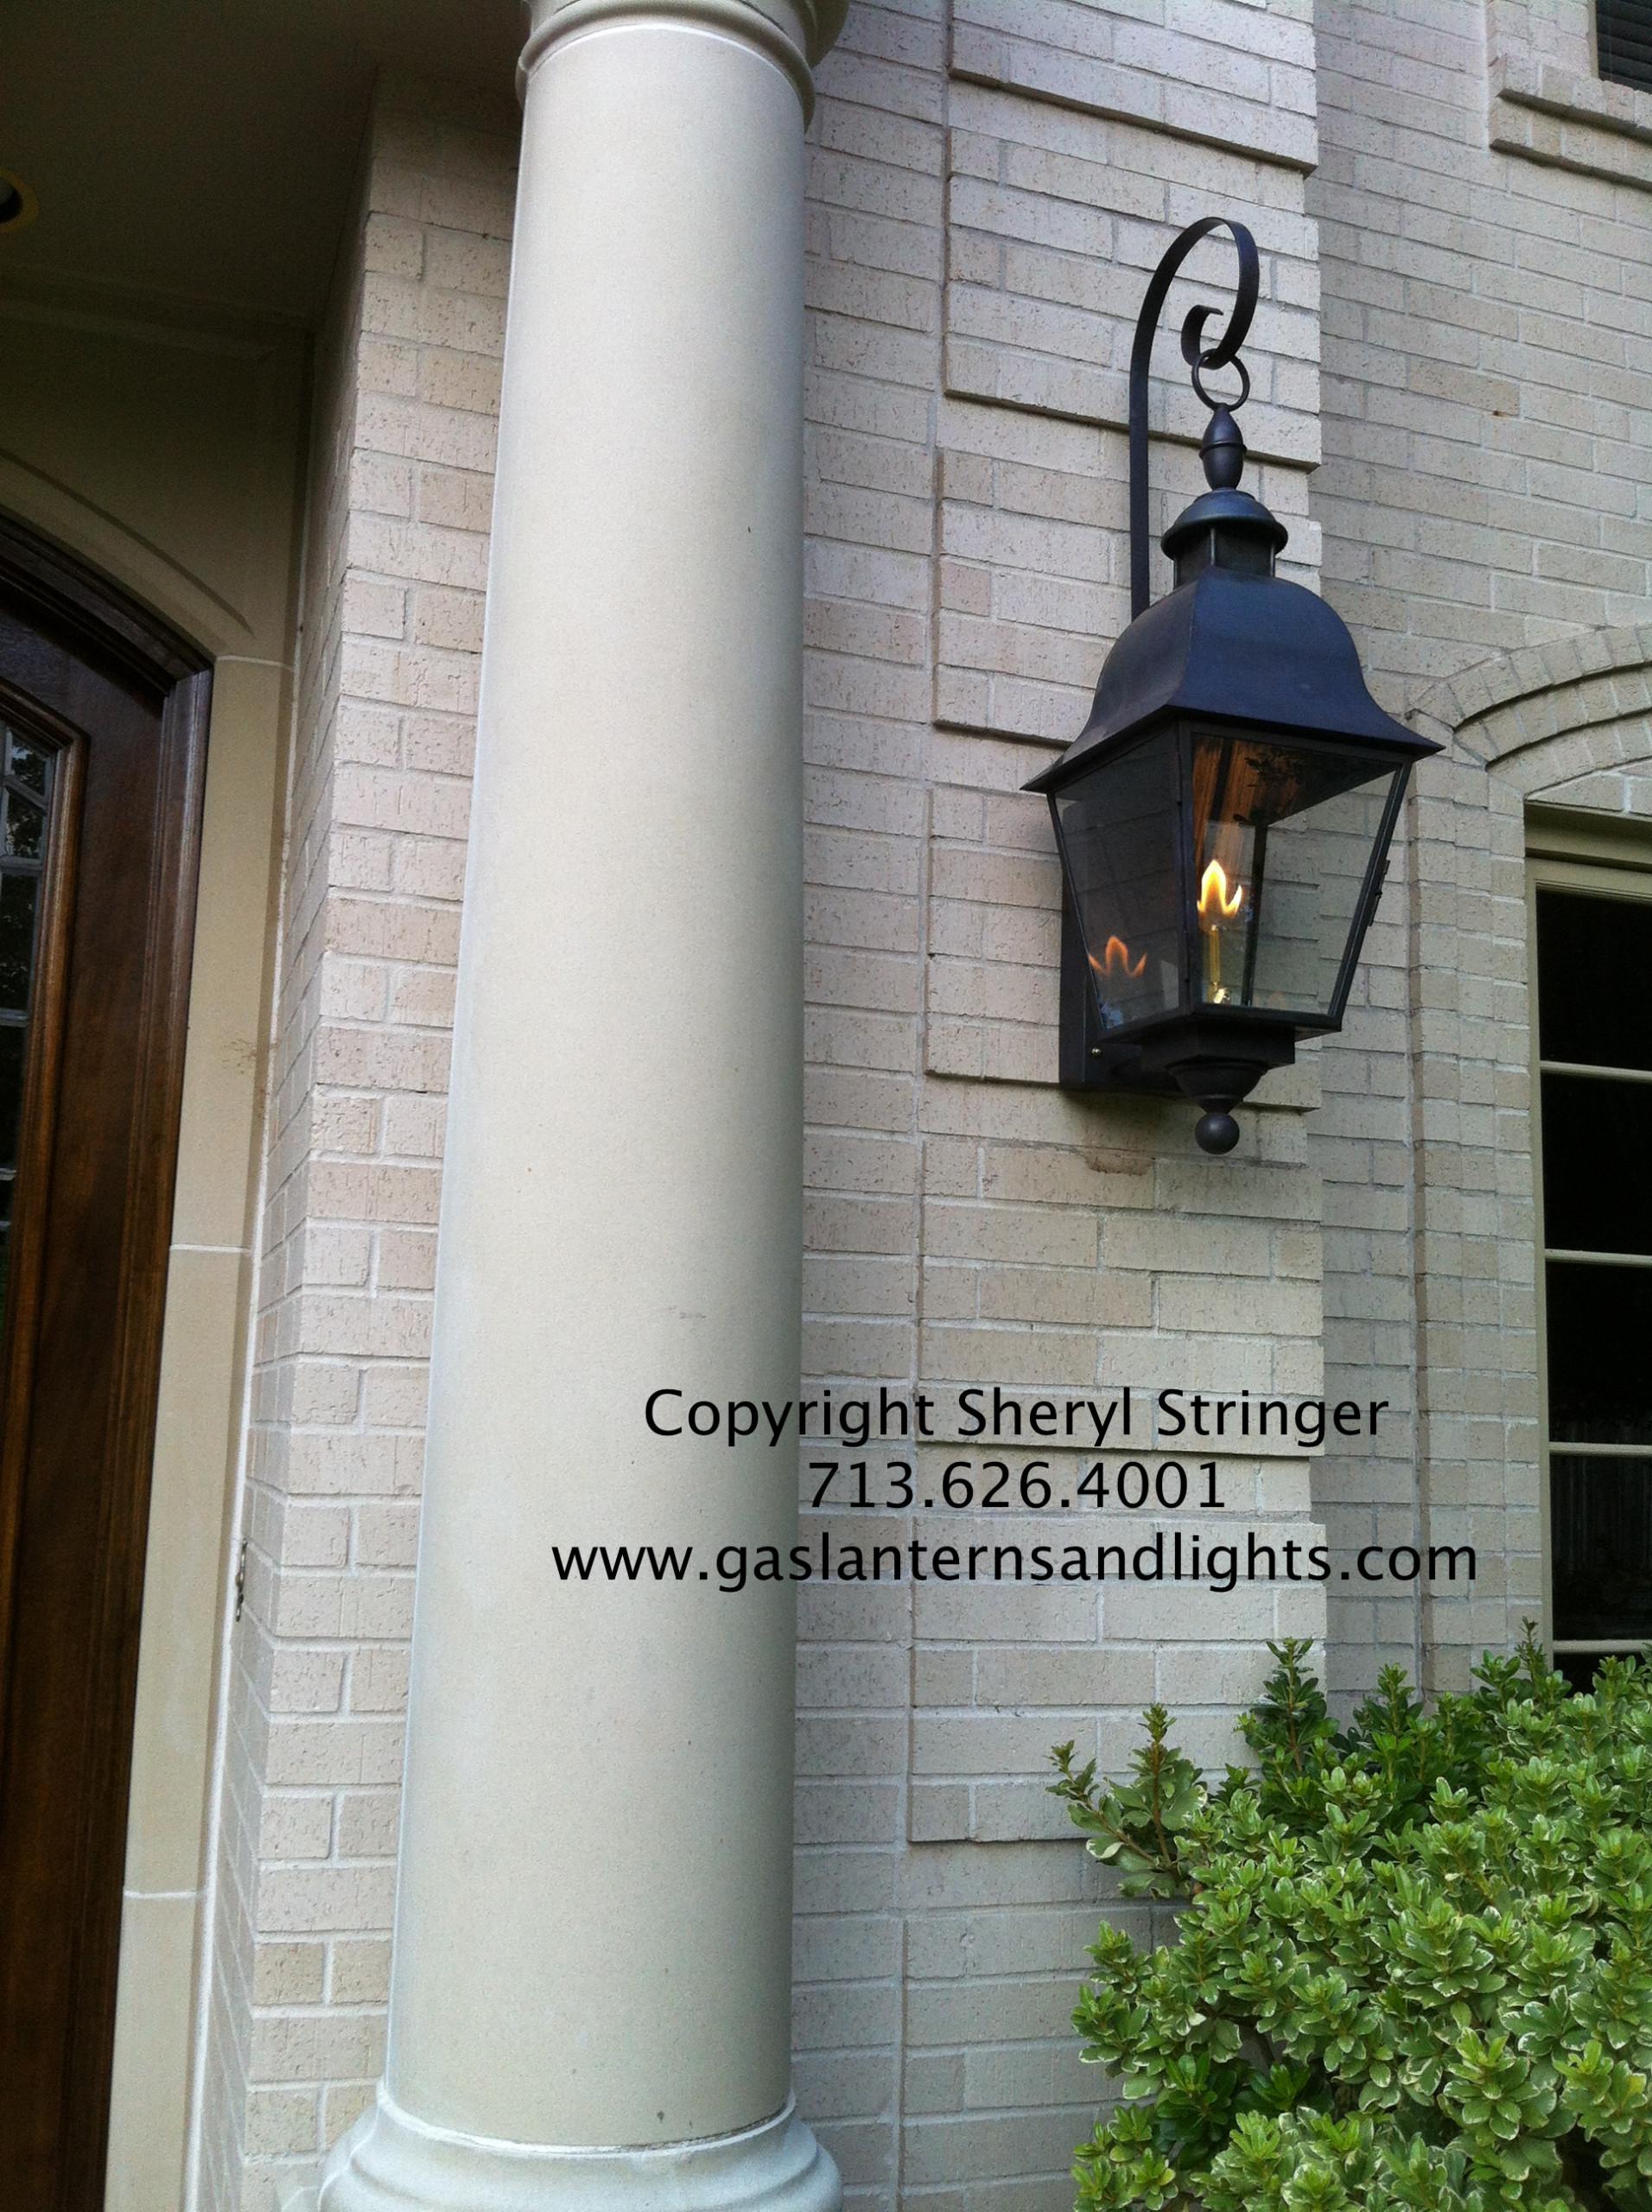 Sheryl's Tuscan Gas Lantern with Top Curl